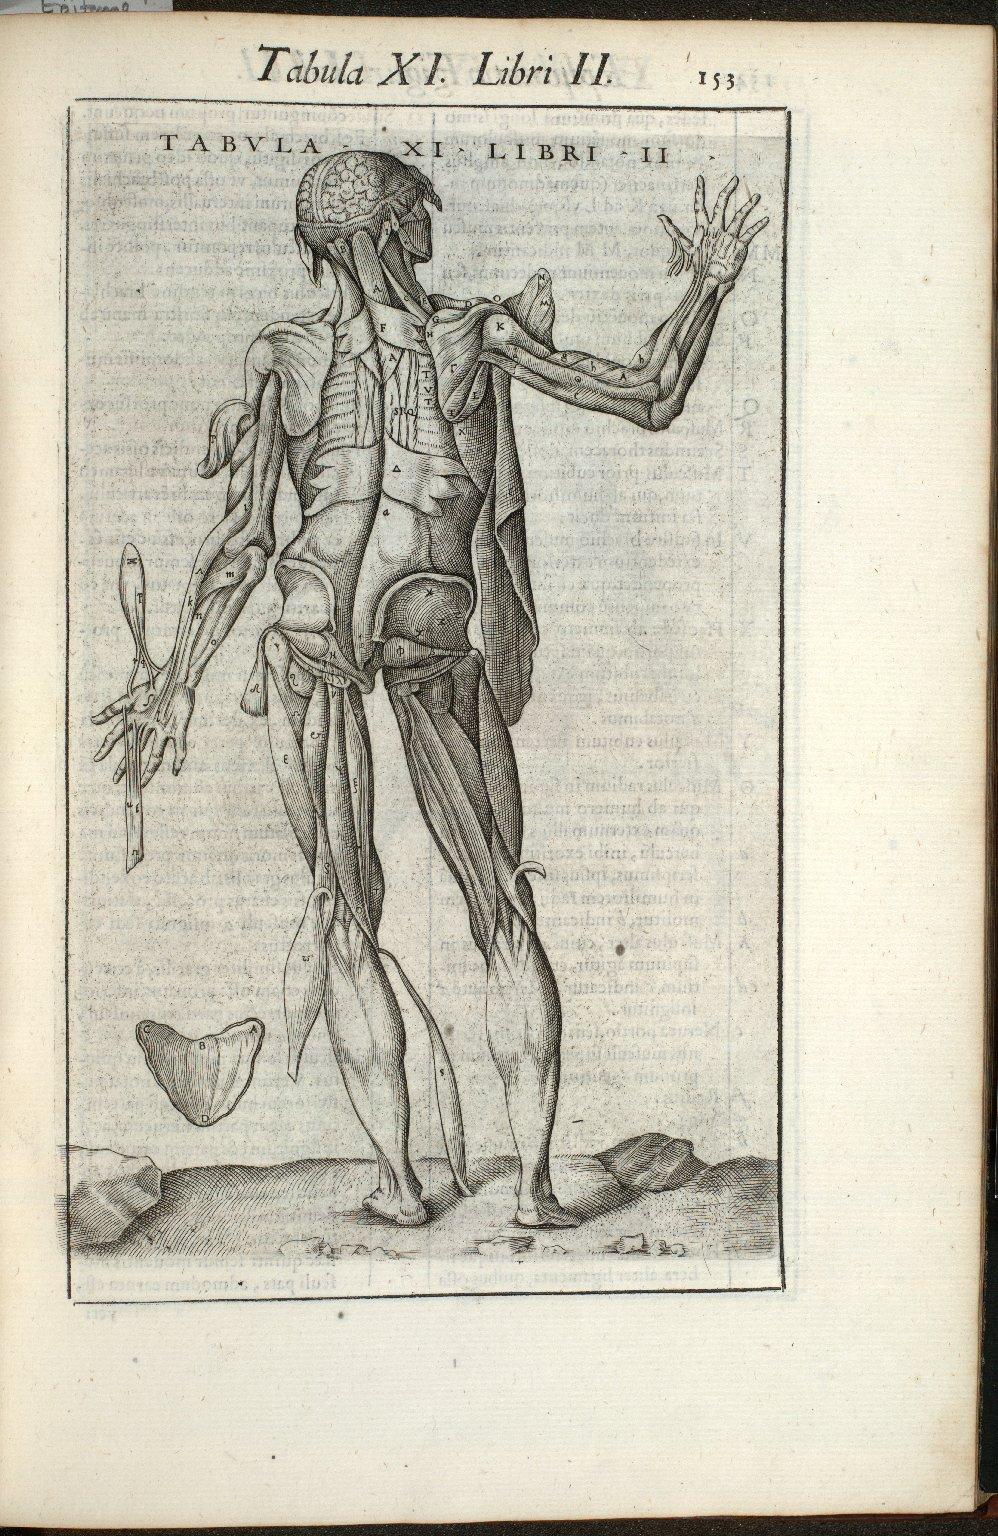 Tabula XI. Libri II.